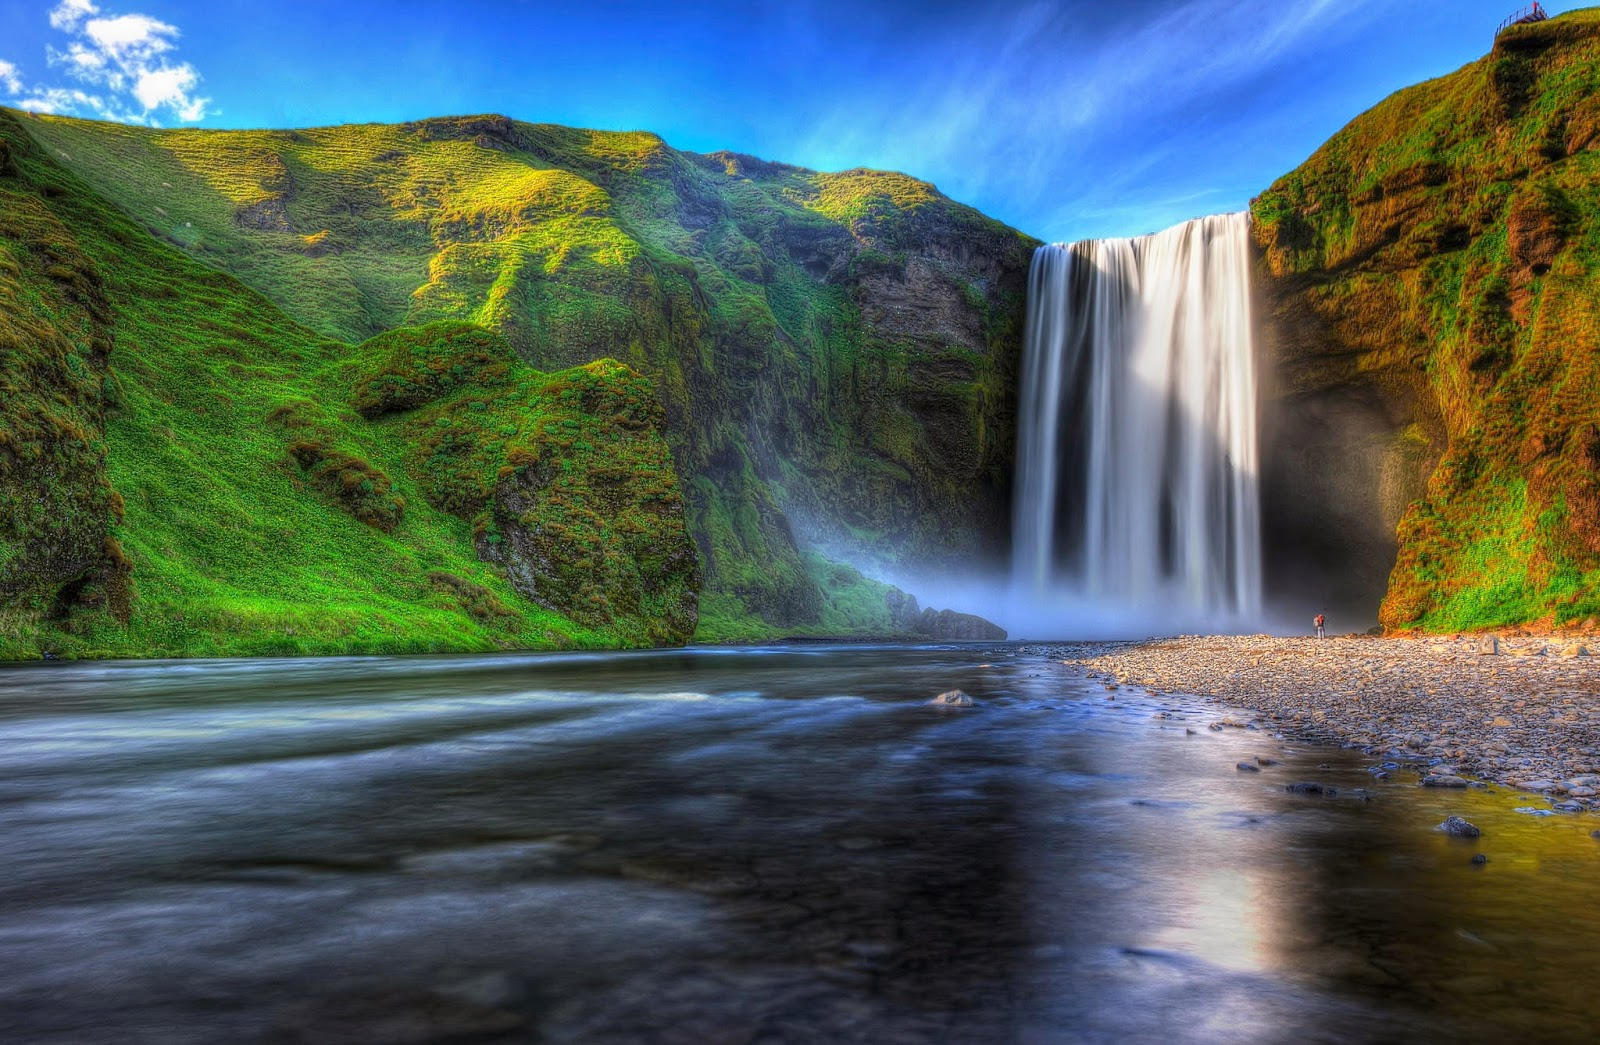 BANCO DE IMGENES 33 fotografas de cascadas con hermosos paisajes